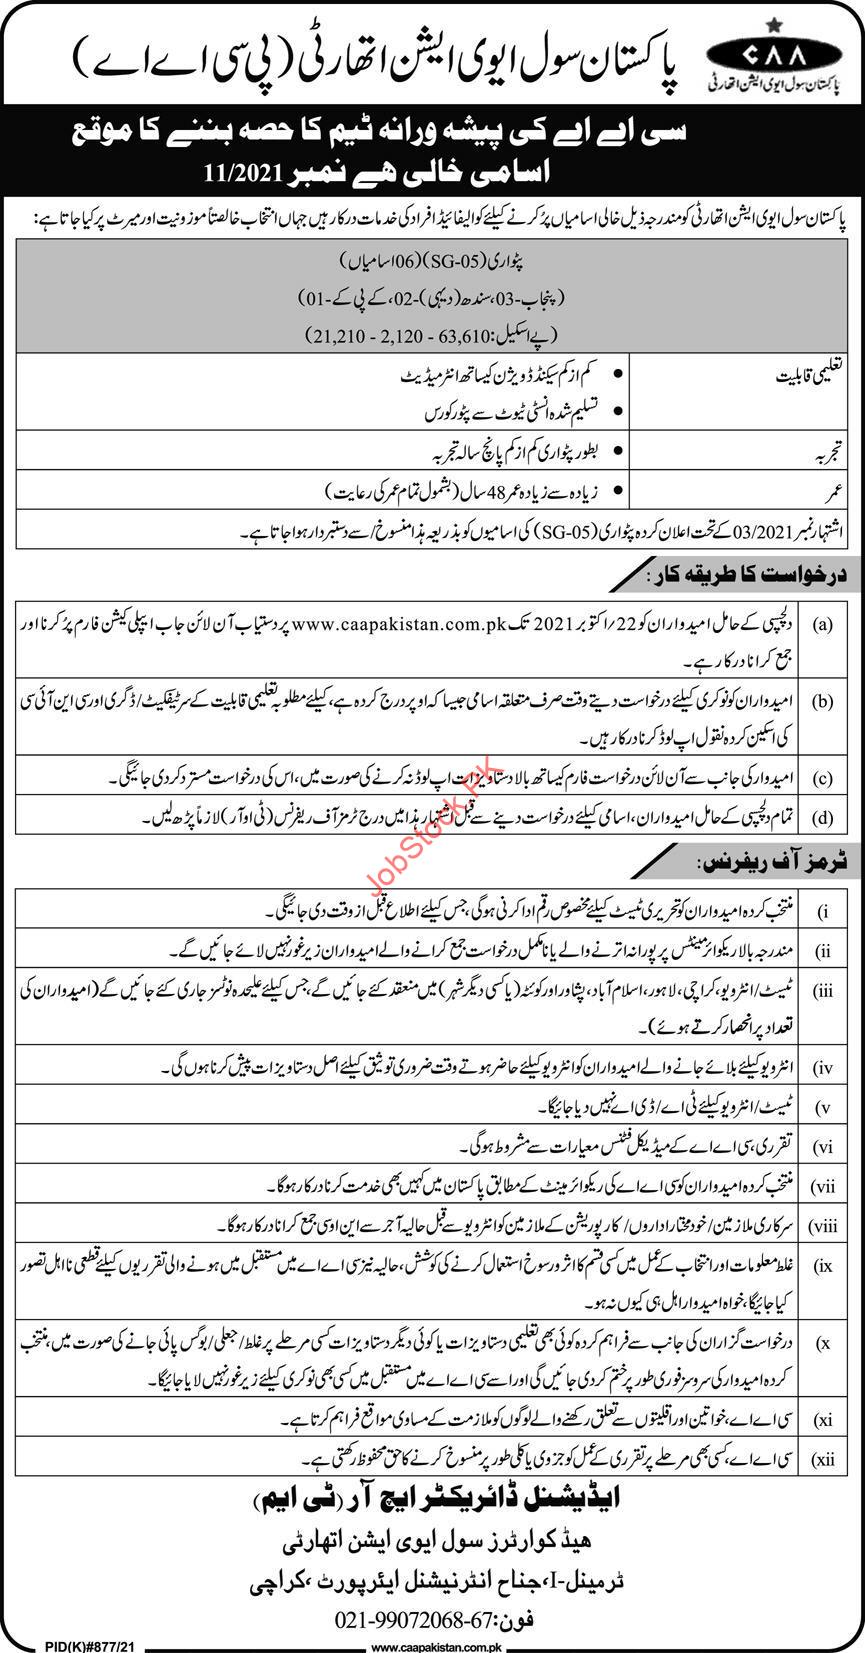 govt jobs in pakistan civil aviation authority 2021 apply online